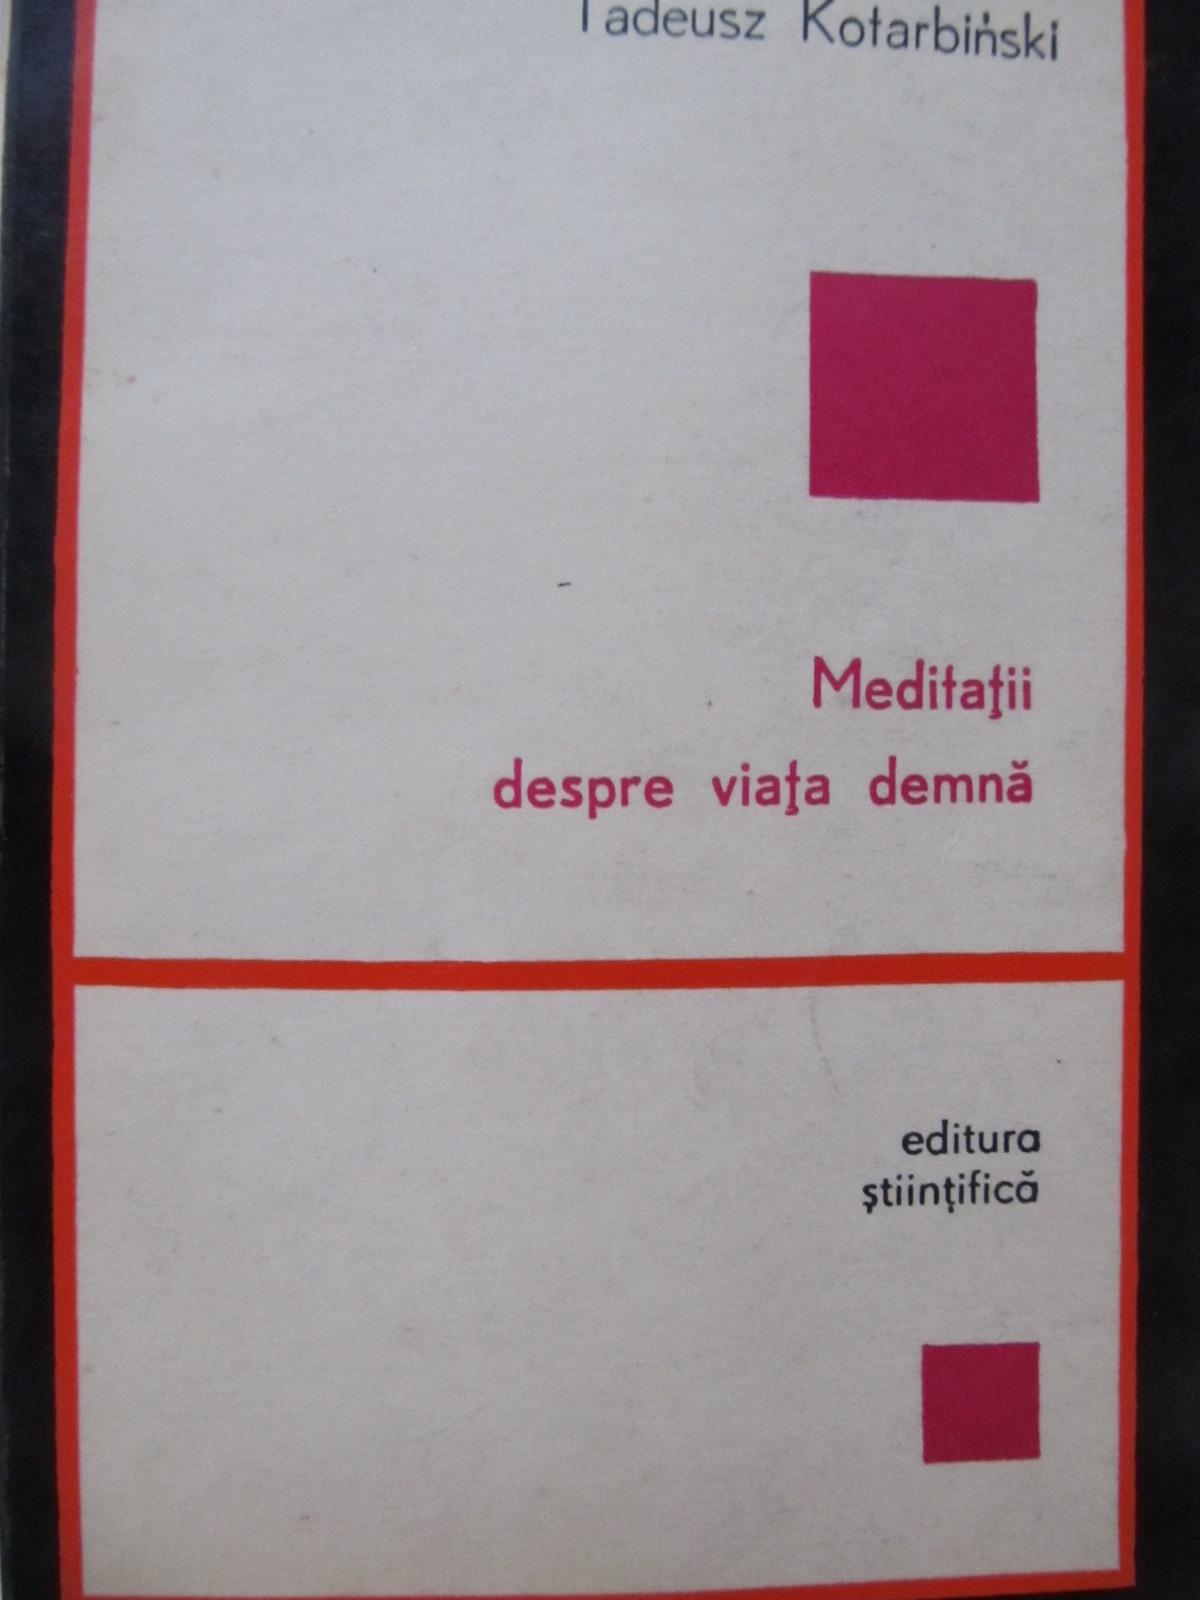 Meditatii despre viata demna - Tadeusz Kotarbinski | Detalii carte